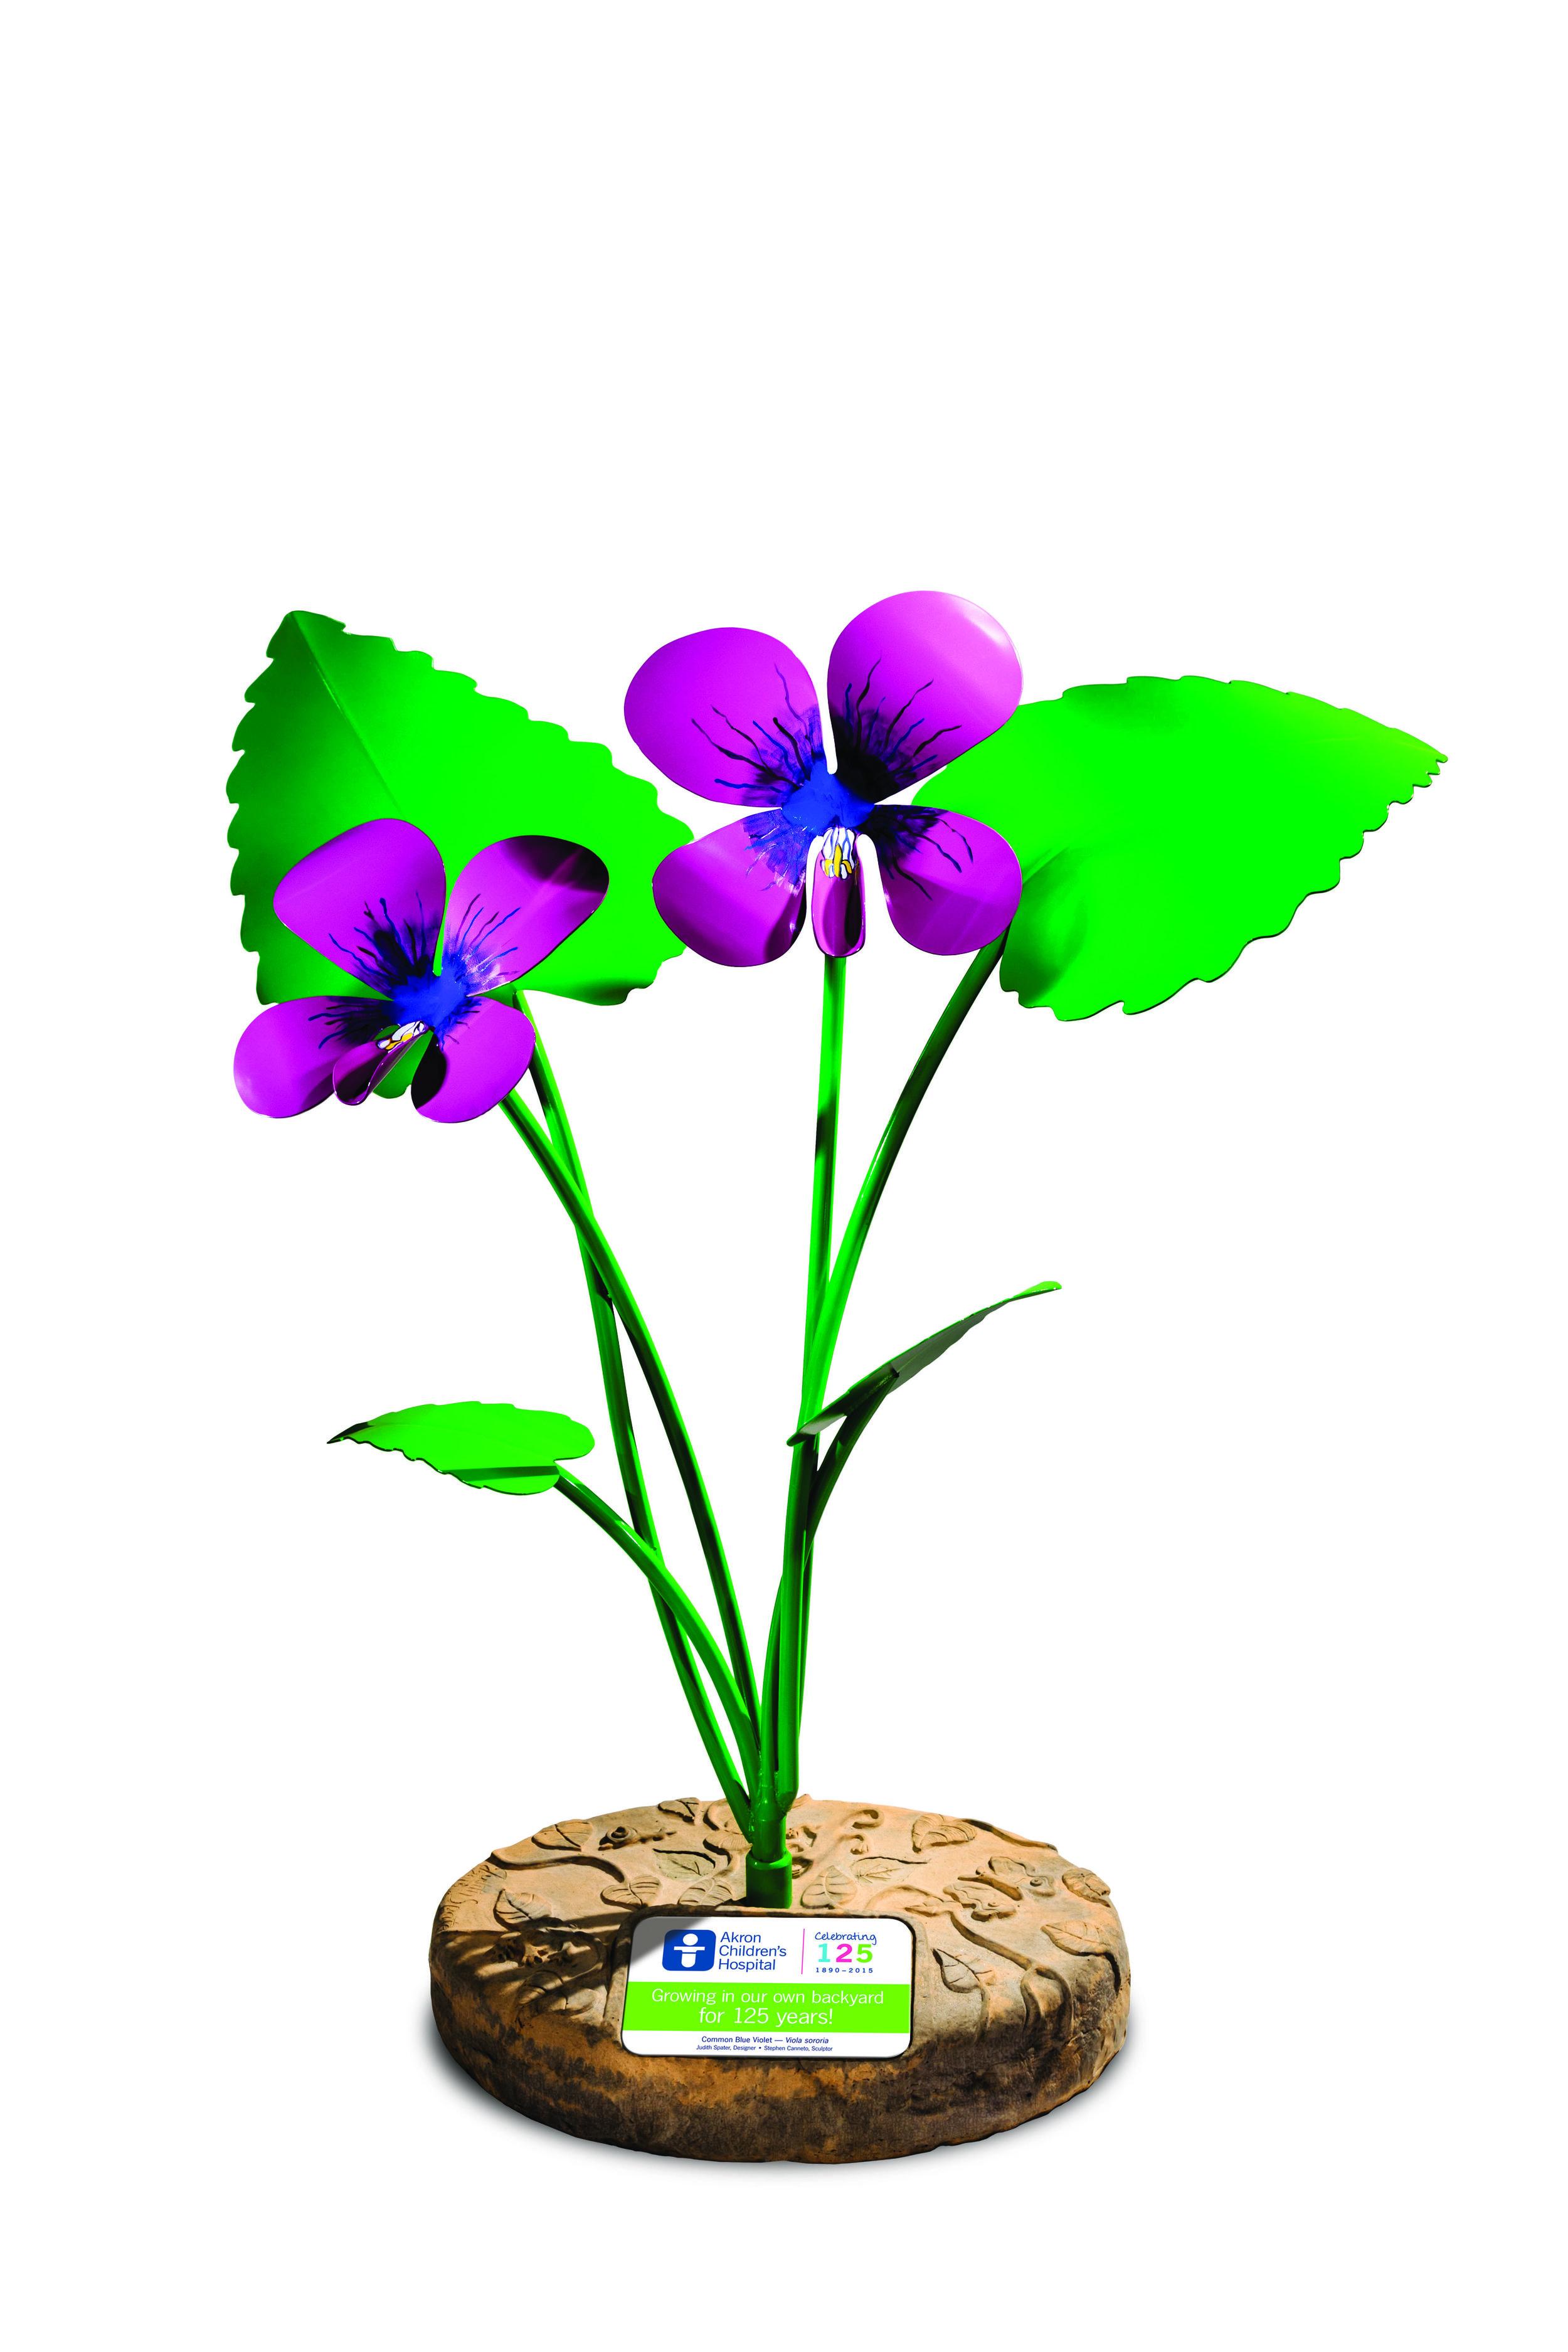 violet_plaque_4CHR - Copy.jpg